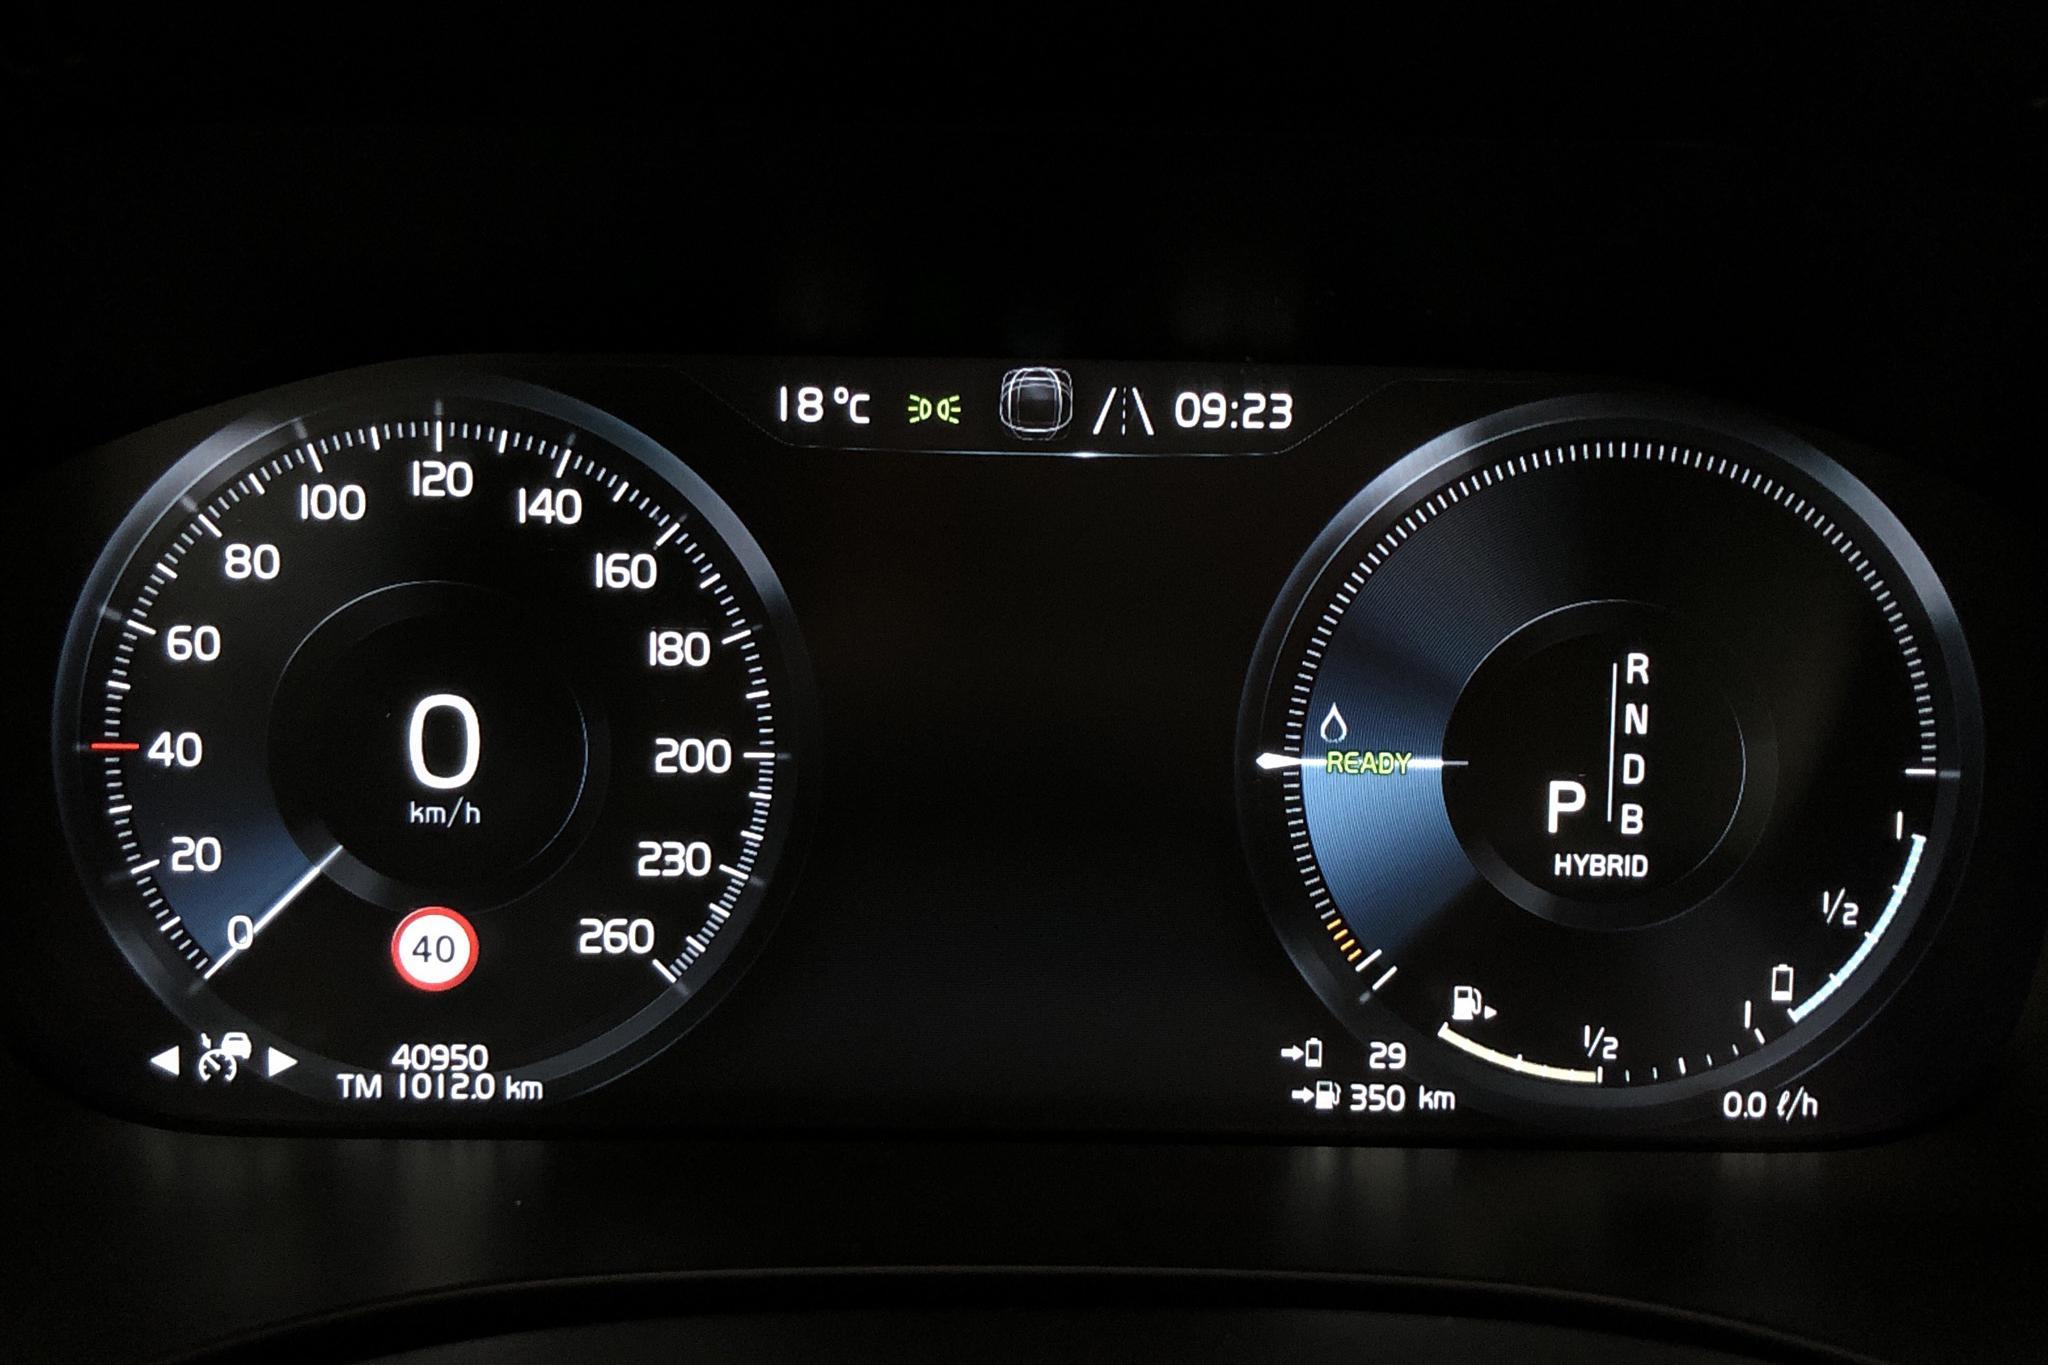 Volvo XC60 T8 AWD Twin Engine (390hk) - 40 950 km - Automatic - black - 2019